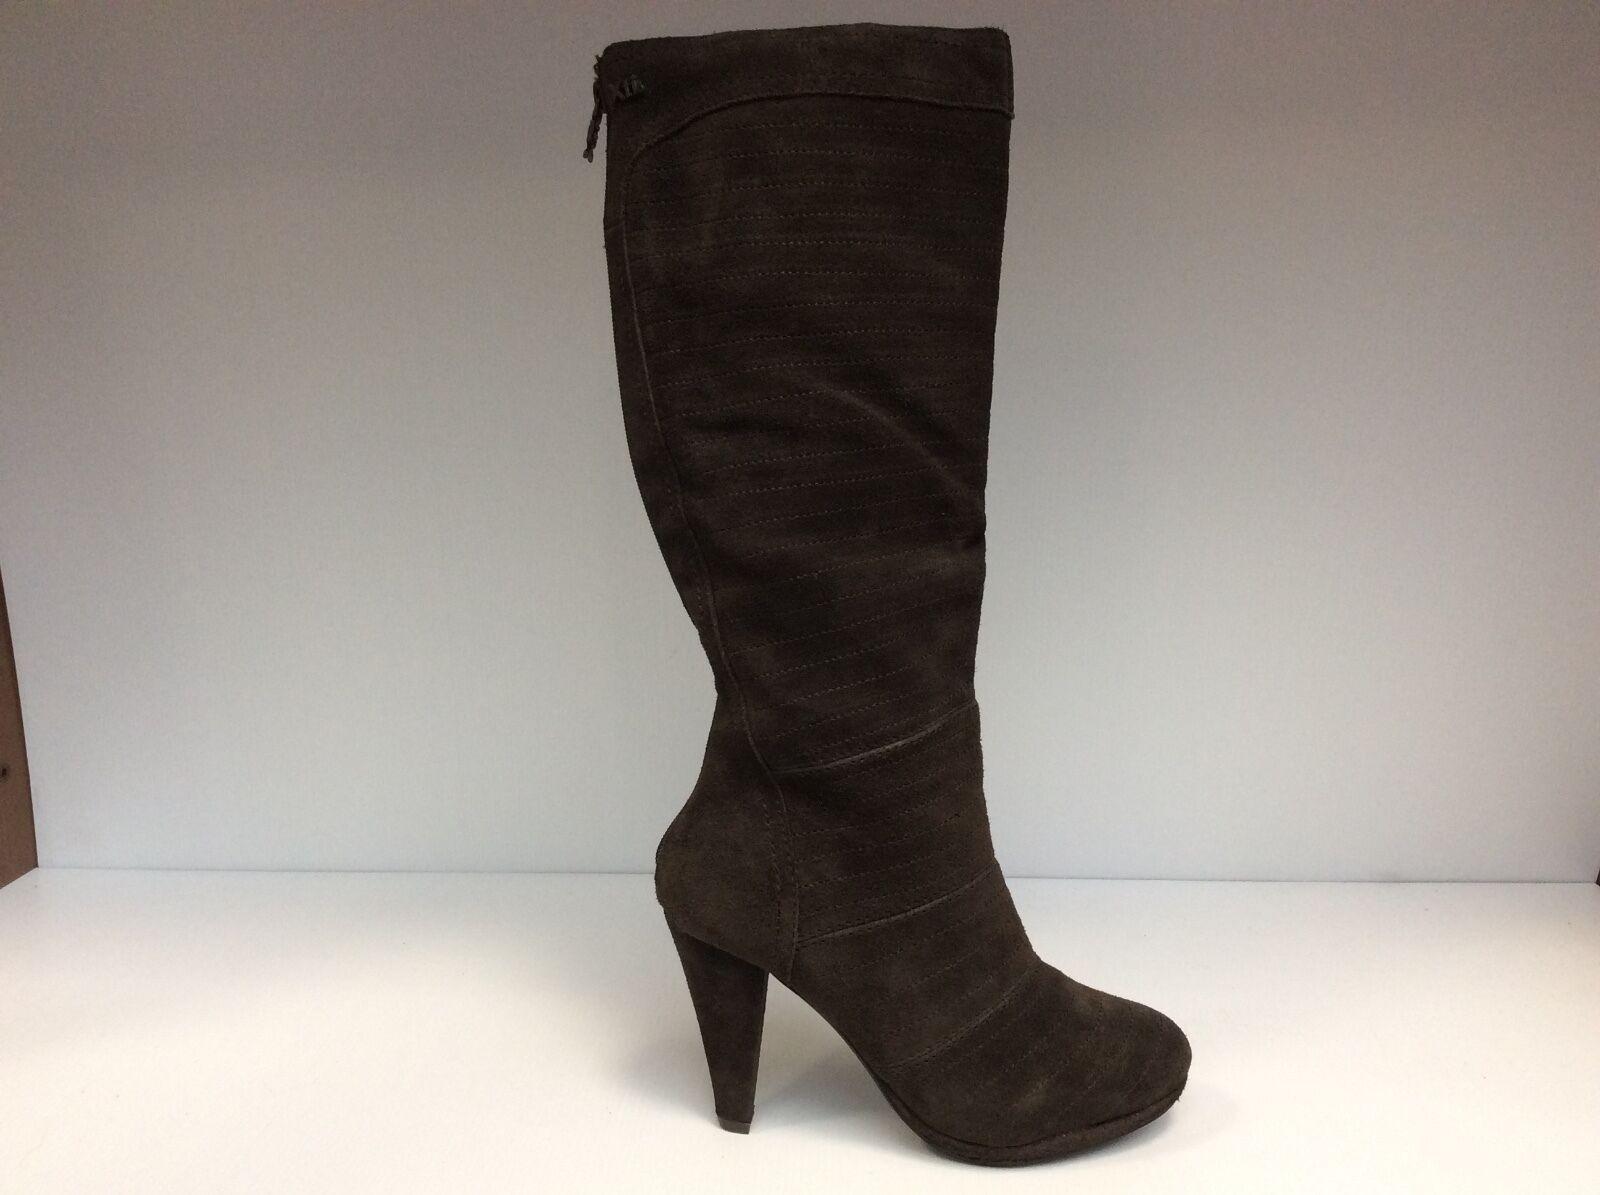 Xti 24720 chaussures Femme bottes Bottines Talon Moyen 9,5 cm Daim marron